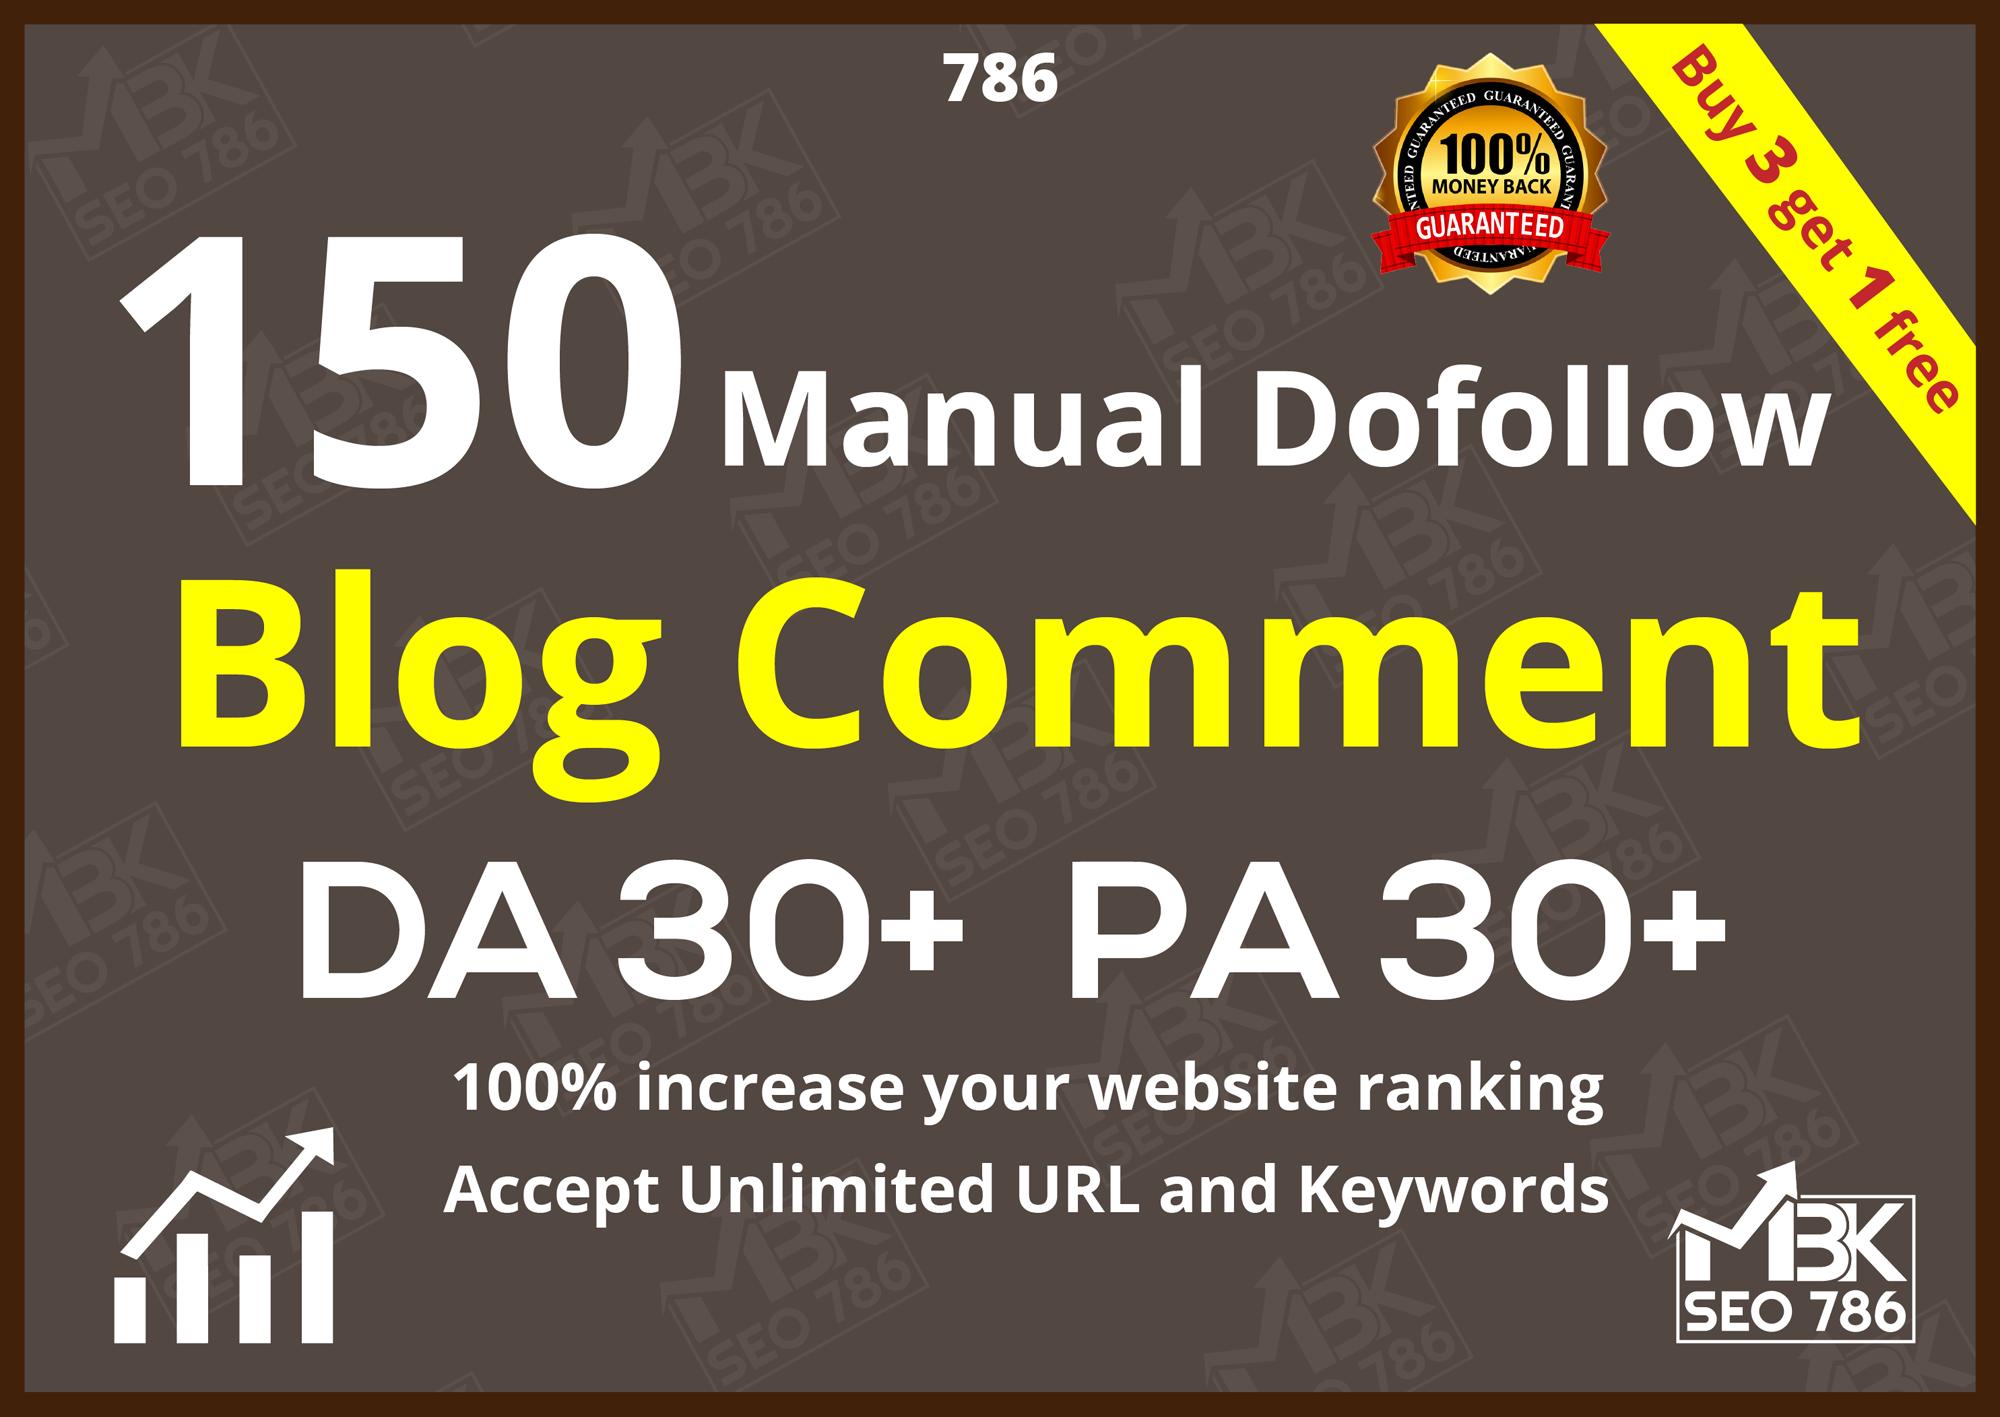 150 Manual Dofollow Blog comment DA30+ PA30+